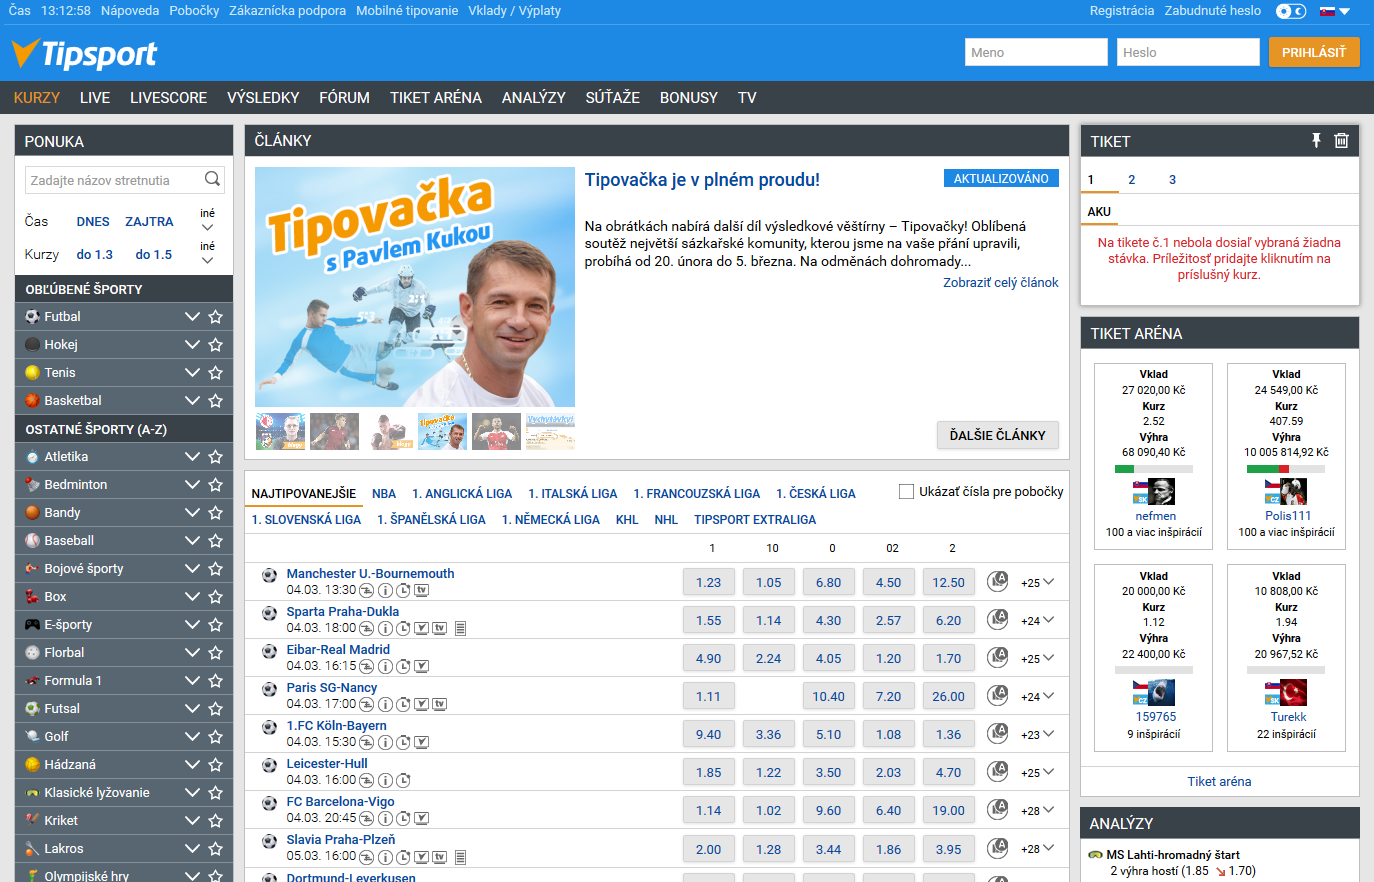 Tipsport web